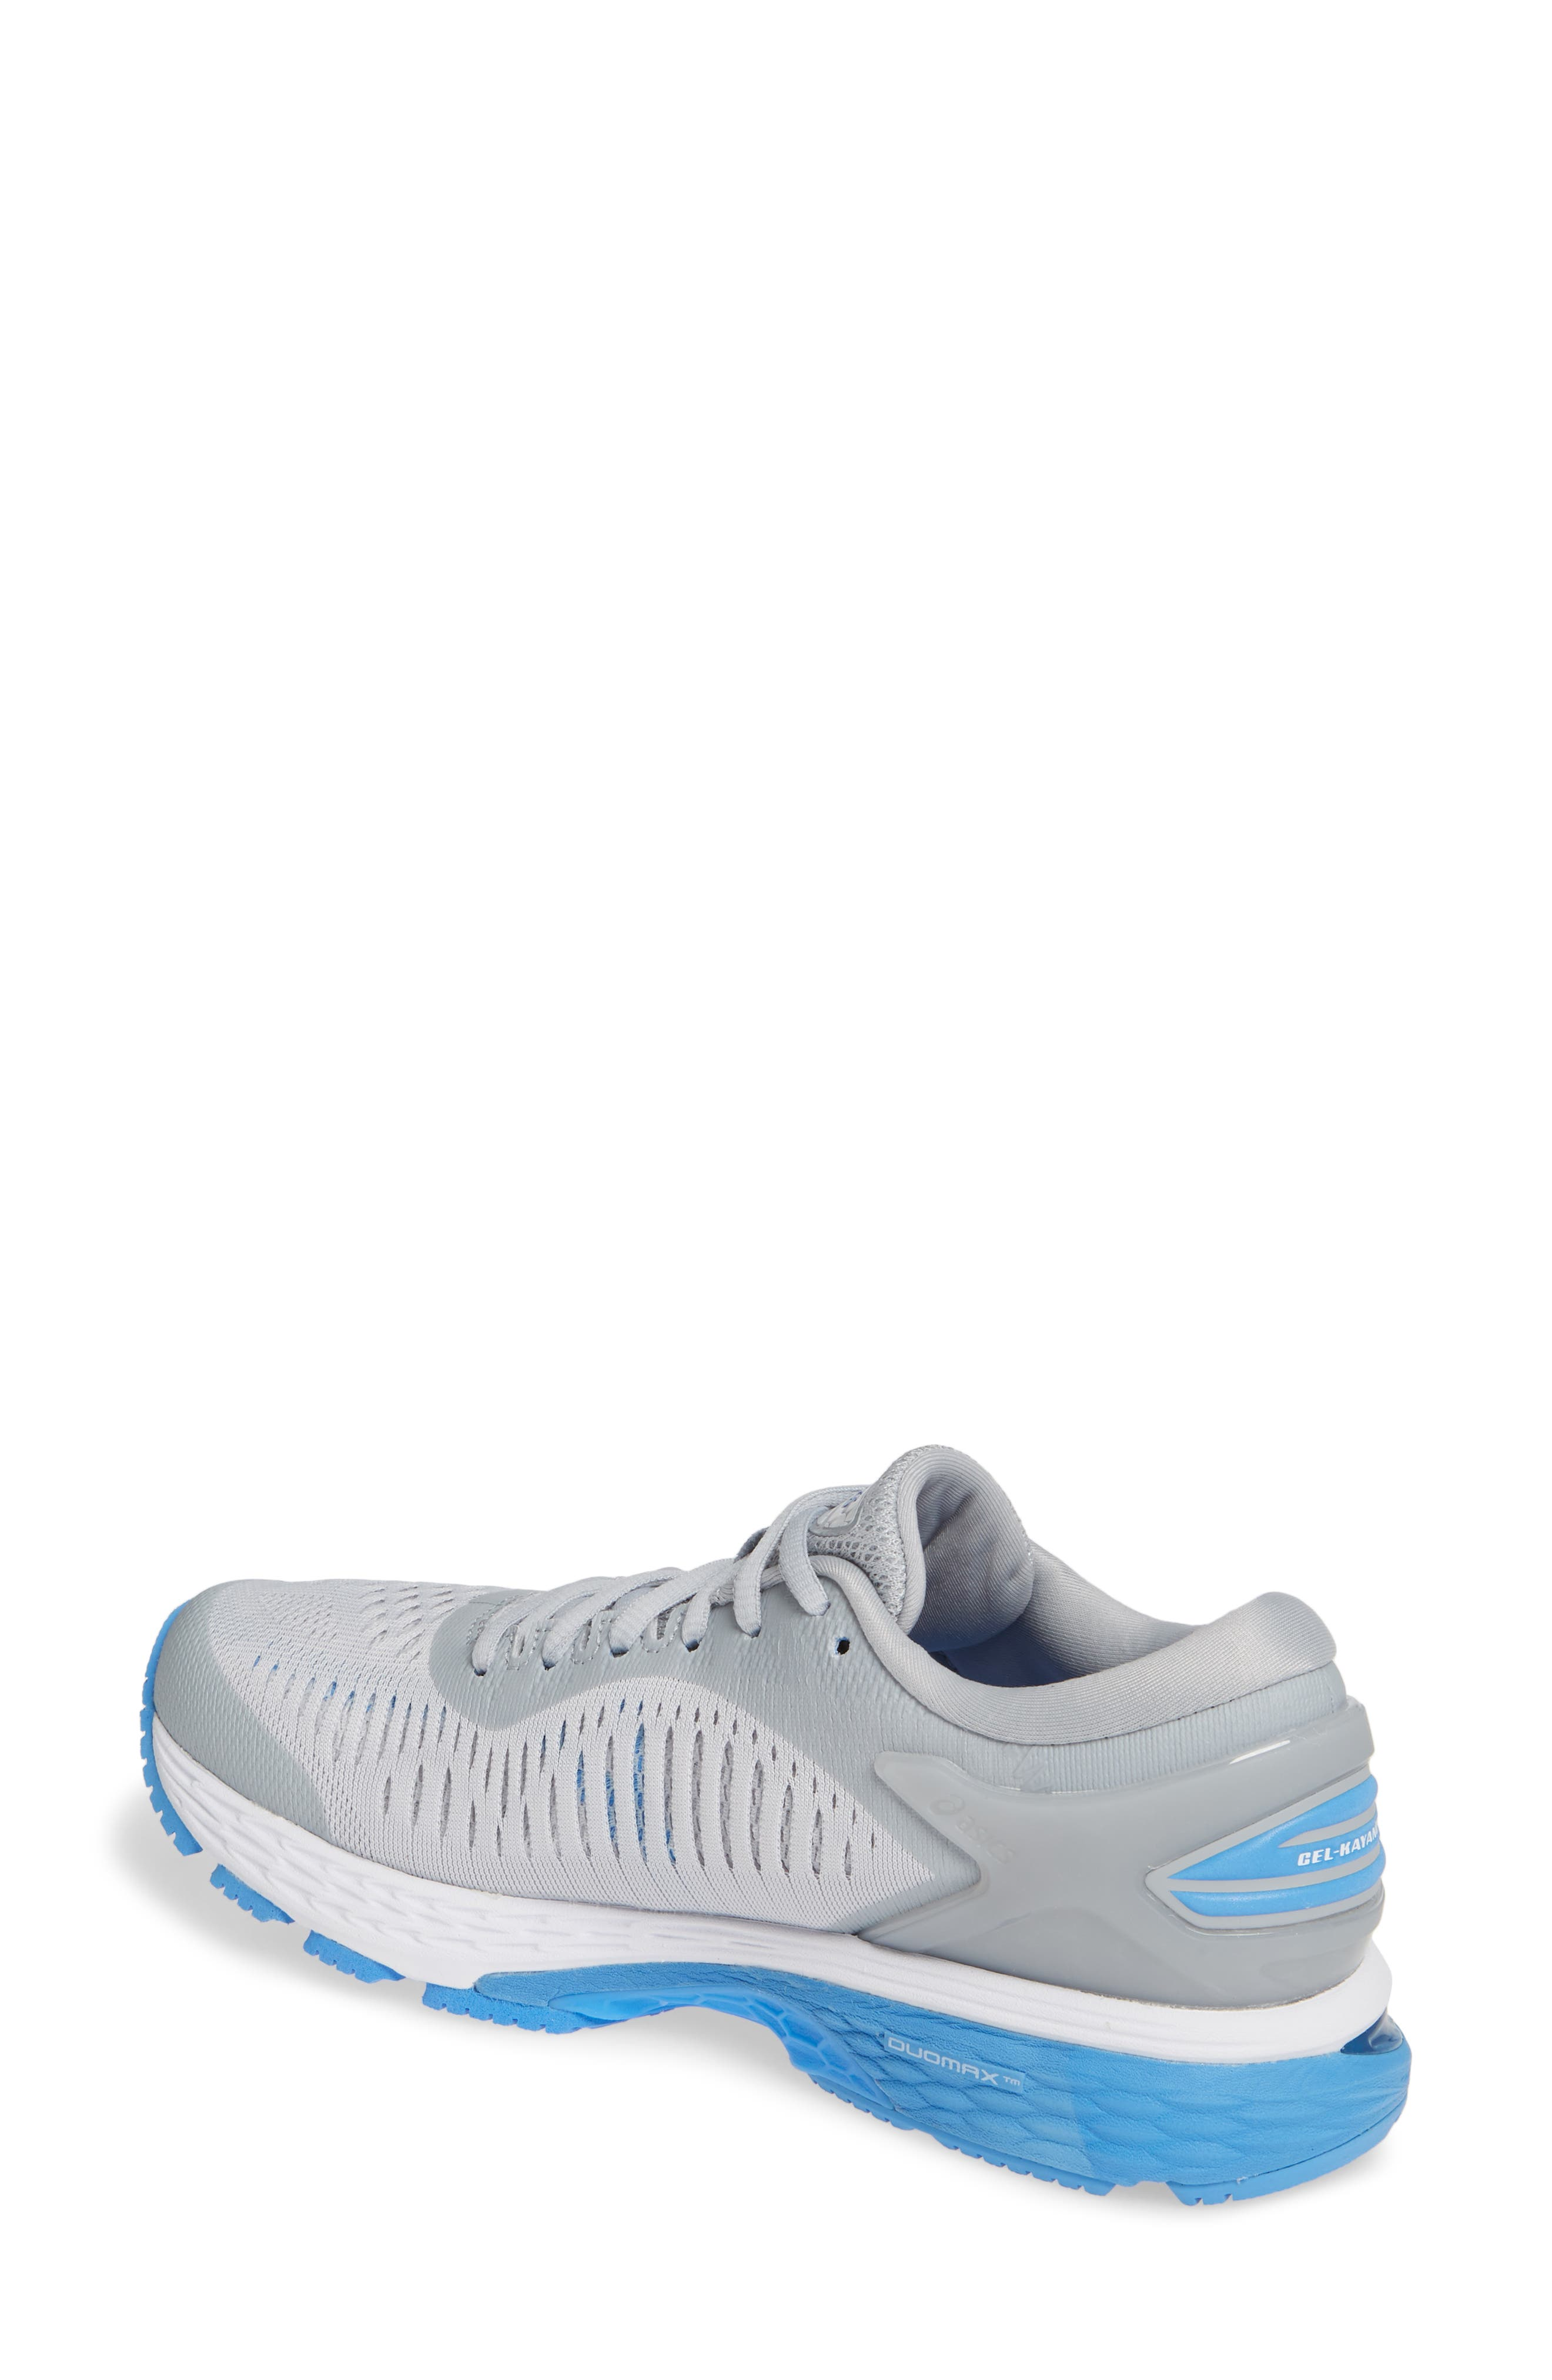 GEL-Kayano<sup>®</sup> 25 Running Shoe,                             Alternate thumbnail 2, color,                             MID GREY/ BLUE